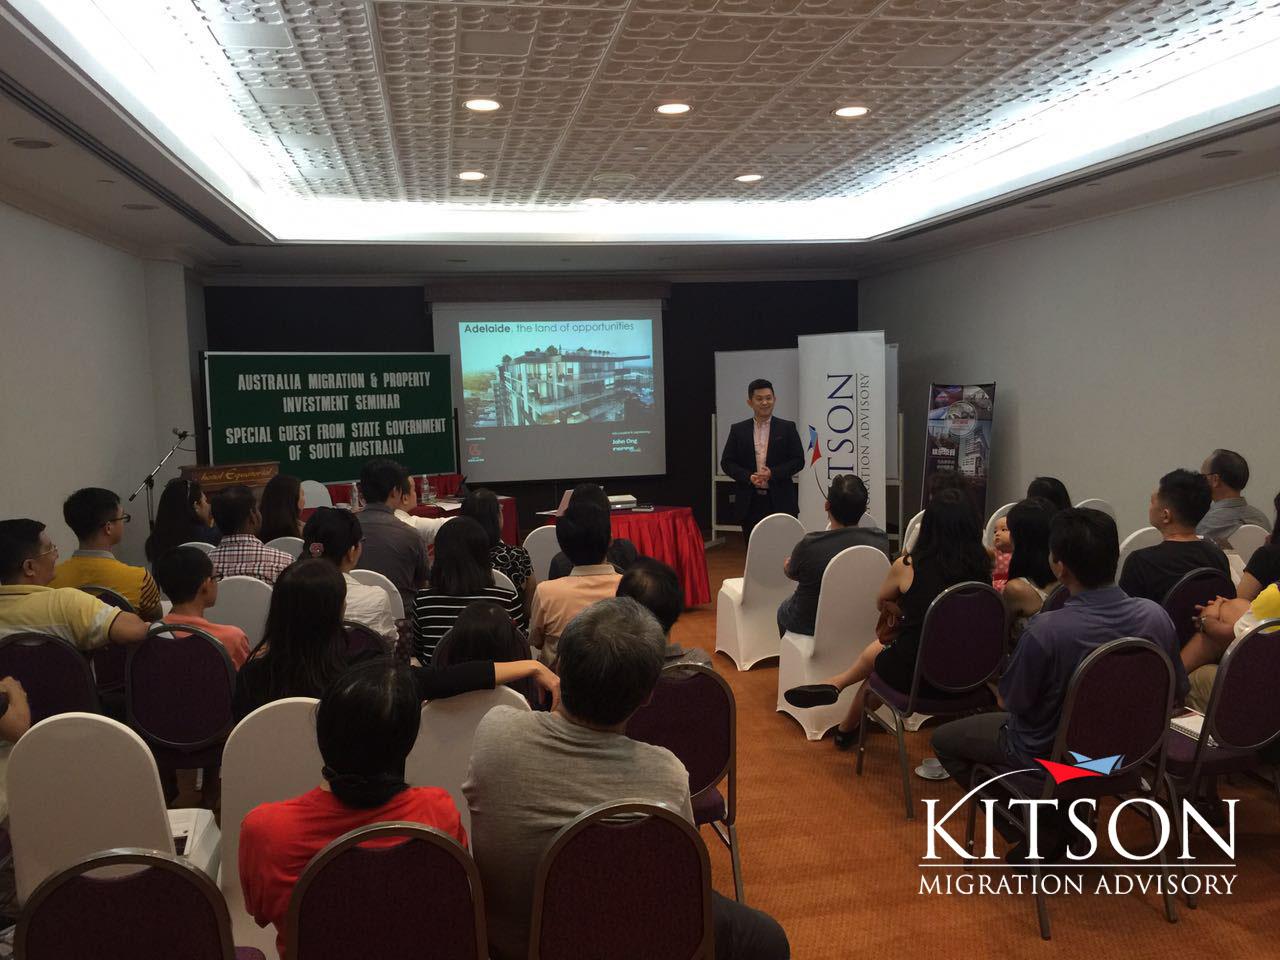 Milestones - Kitson Migration Advisory Review